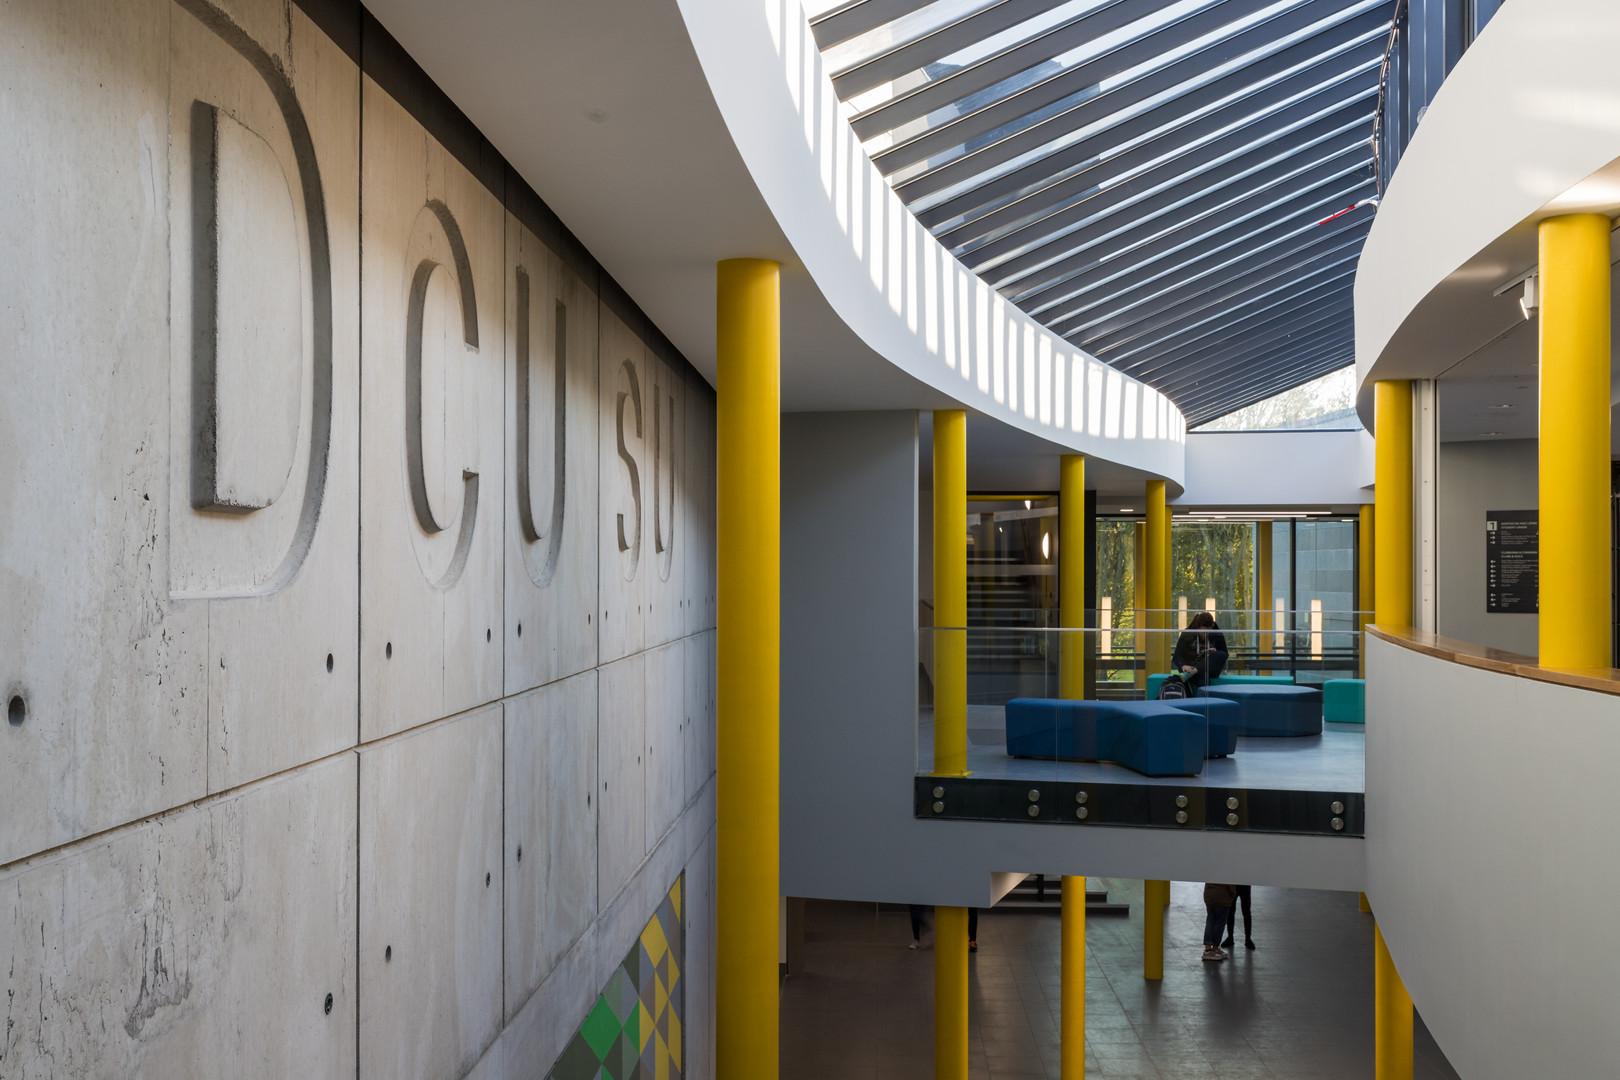 First floor of main atrium of Student Hub in DCU, Dublin